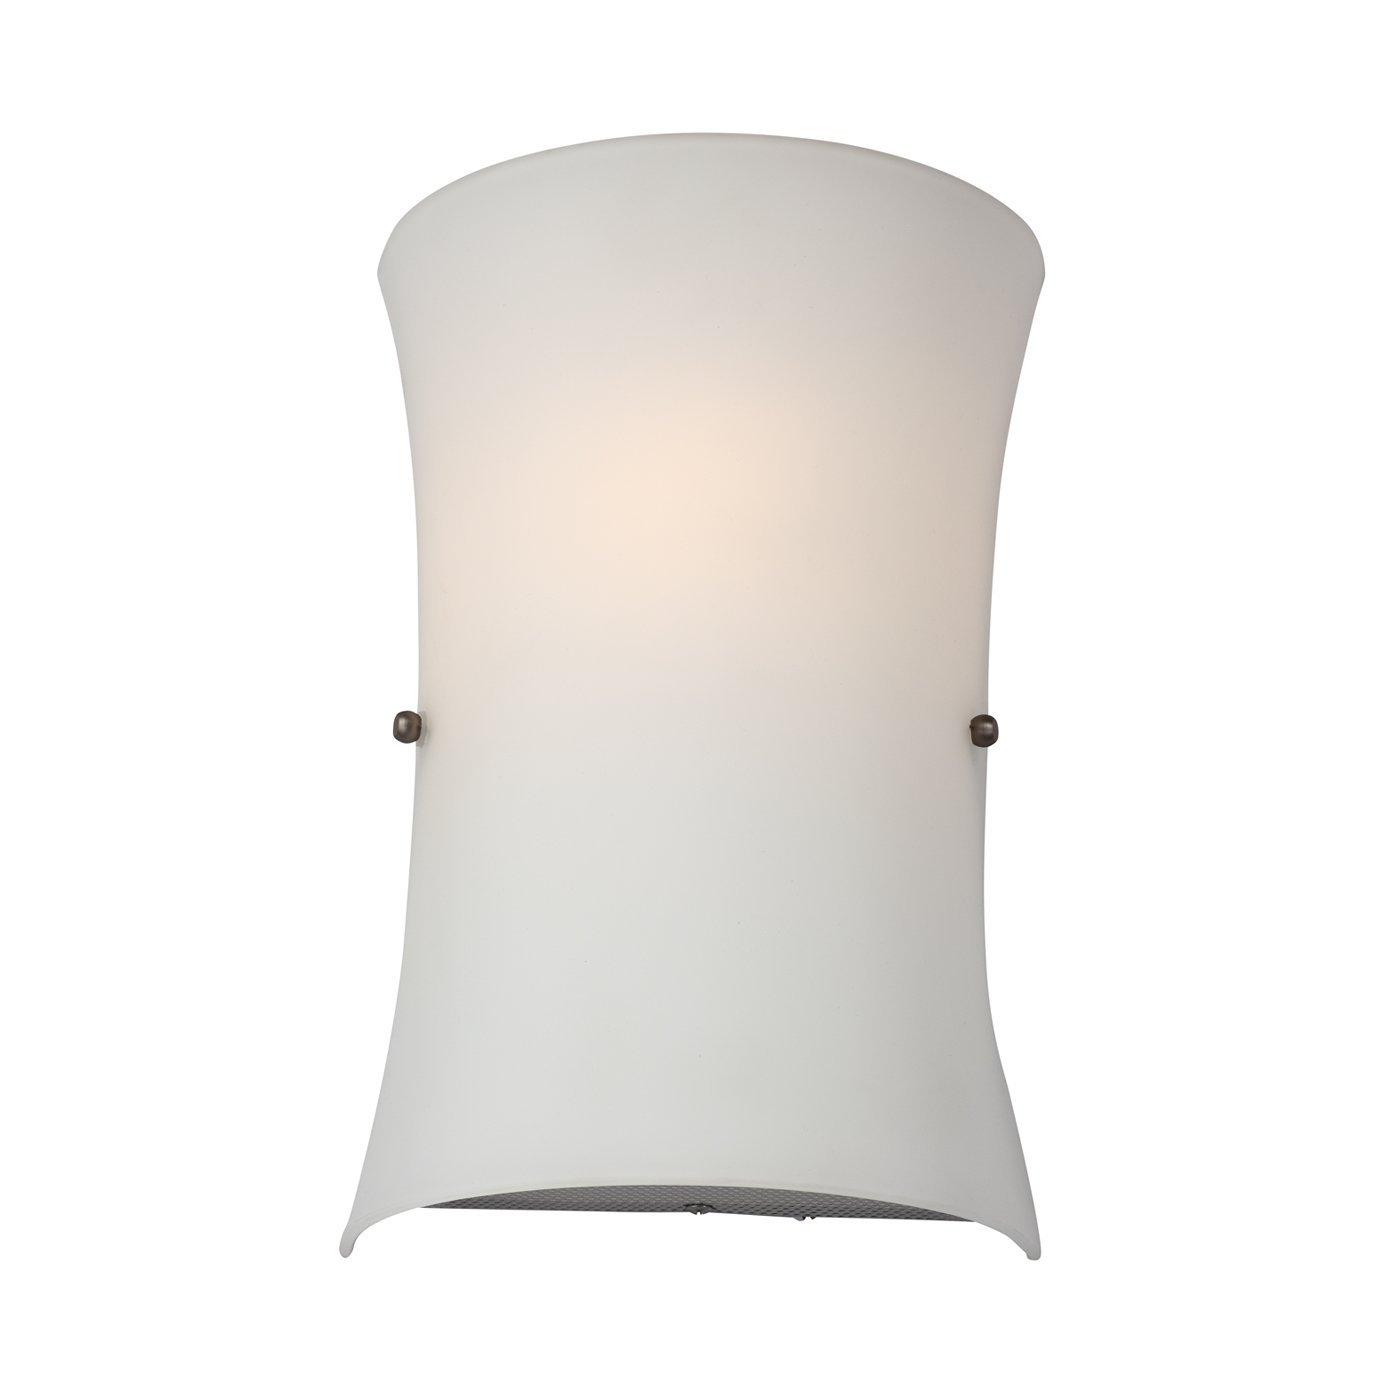 Dvi dvp1242mf op 2 light kelowna wall sconce multiple finials lamp finials amazon com